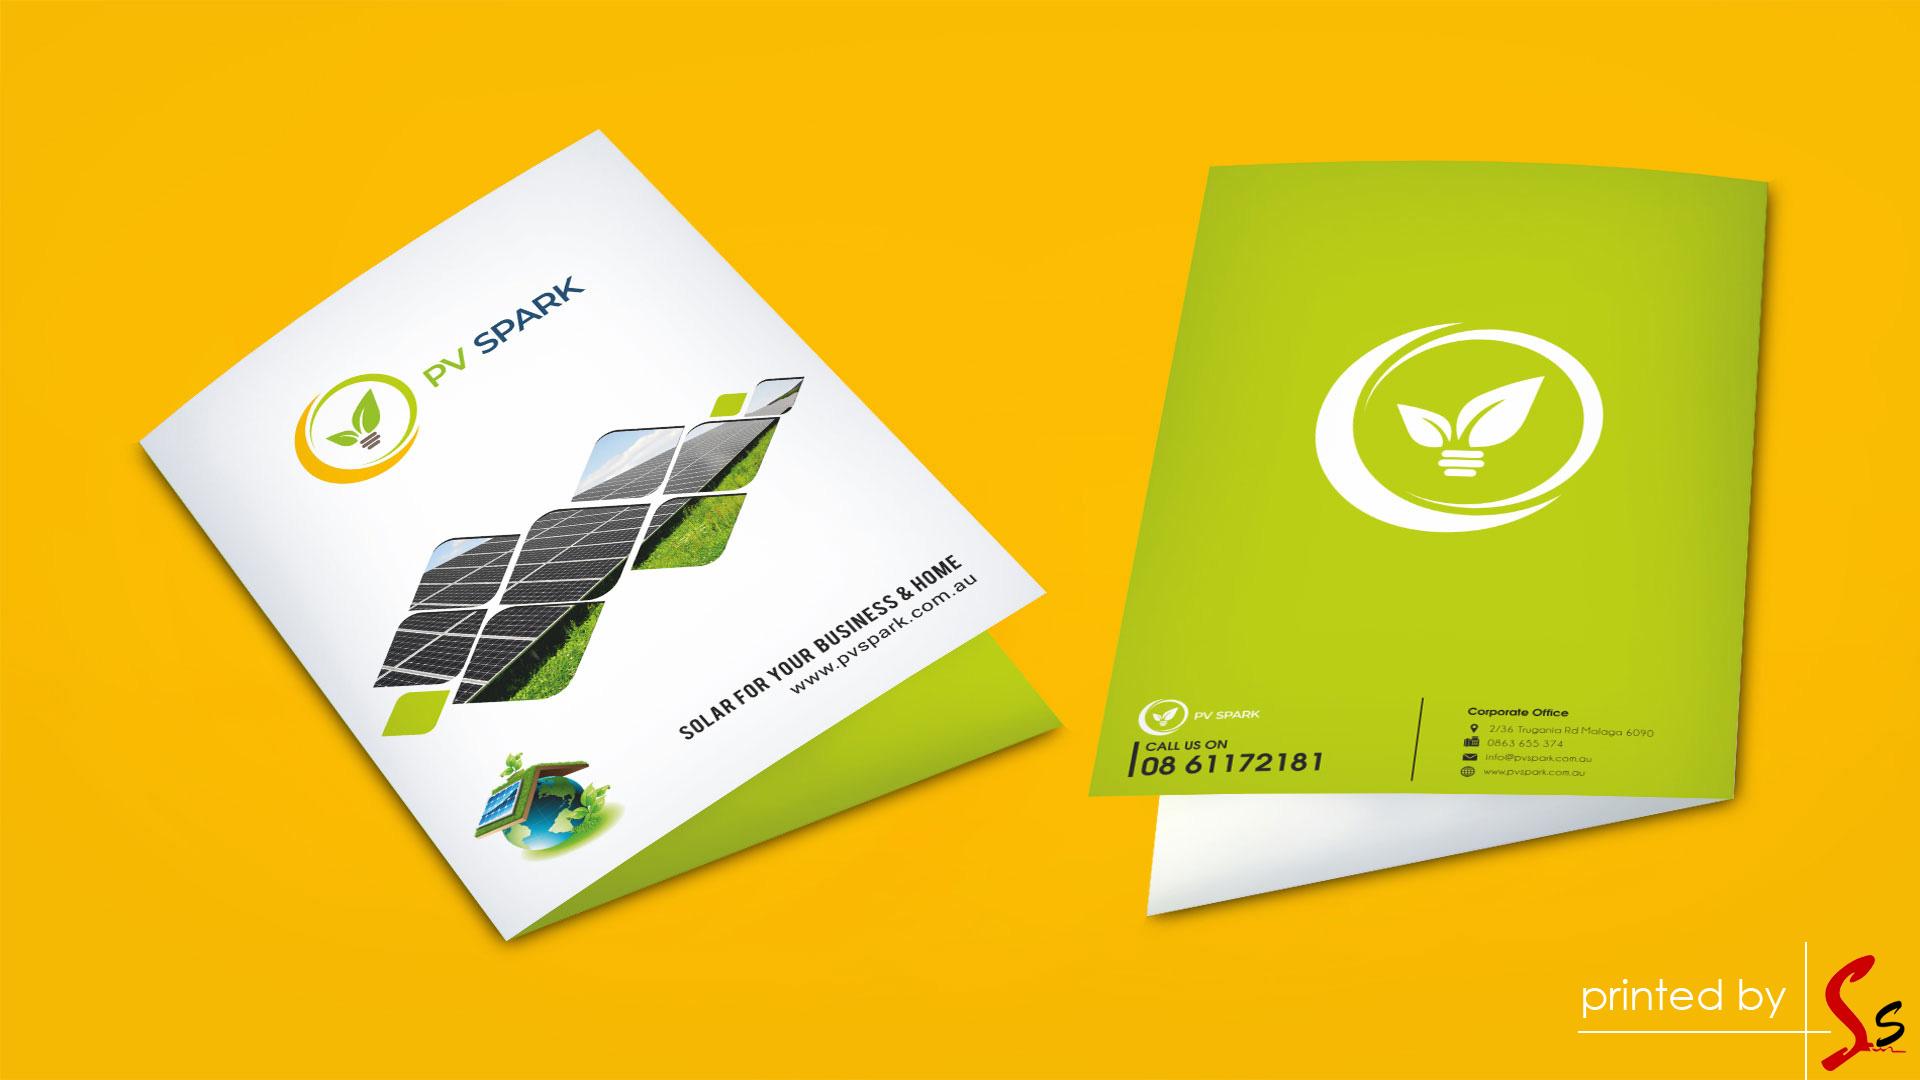 PV Spark Printing